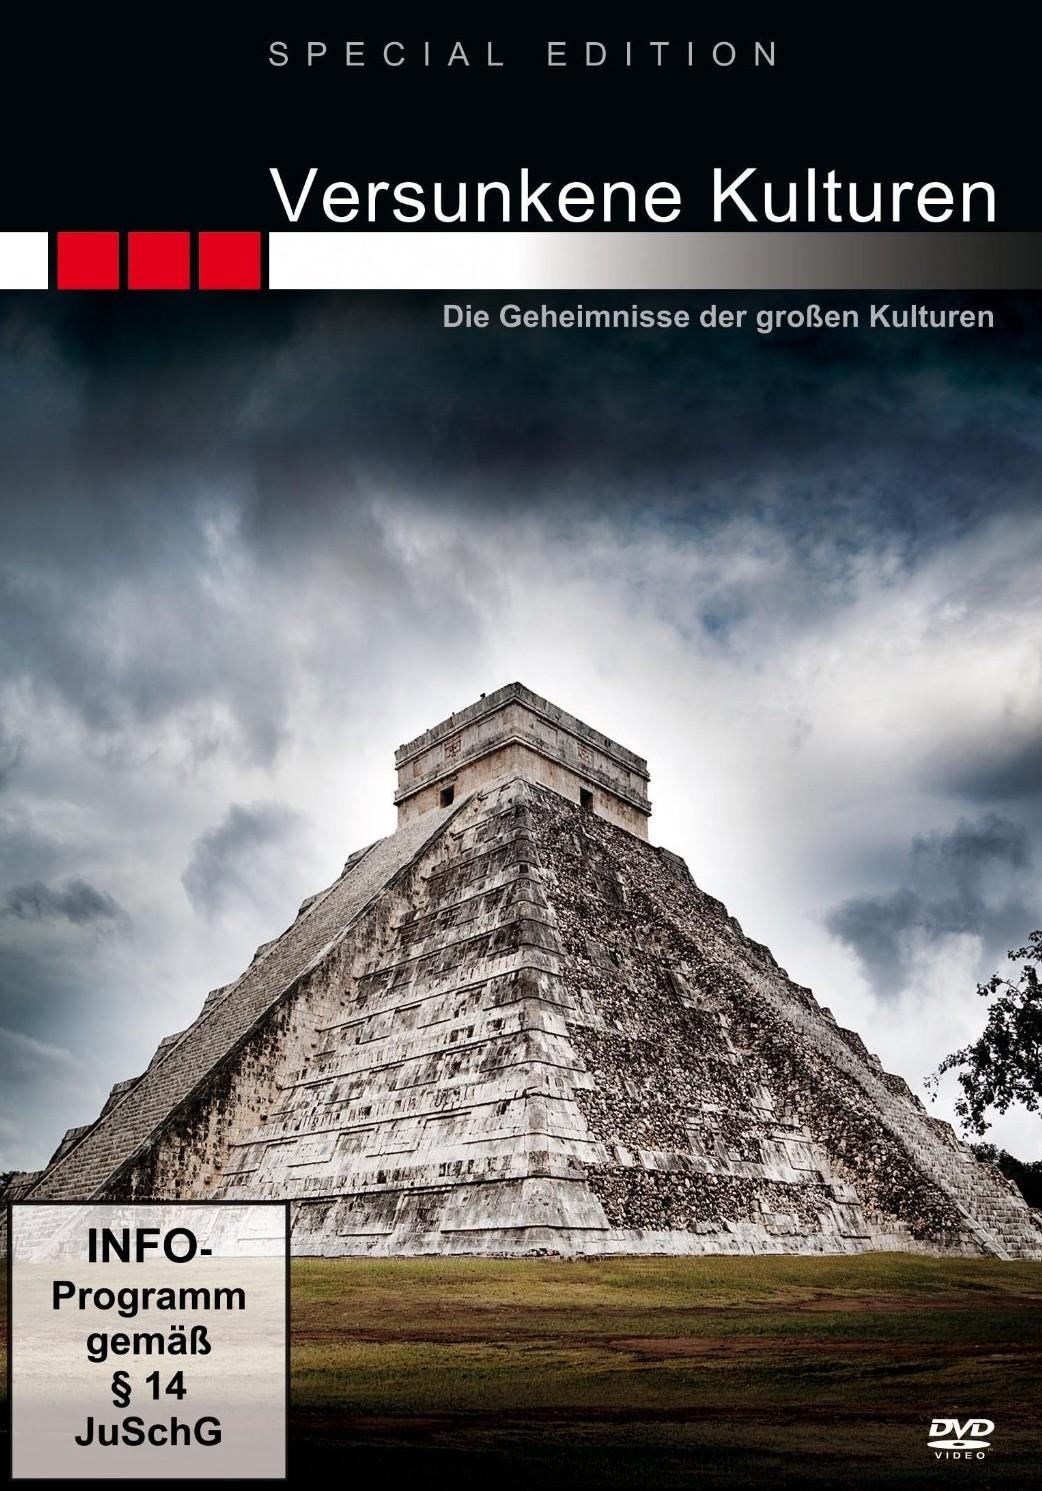 BBC - Versunkene Kulturen